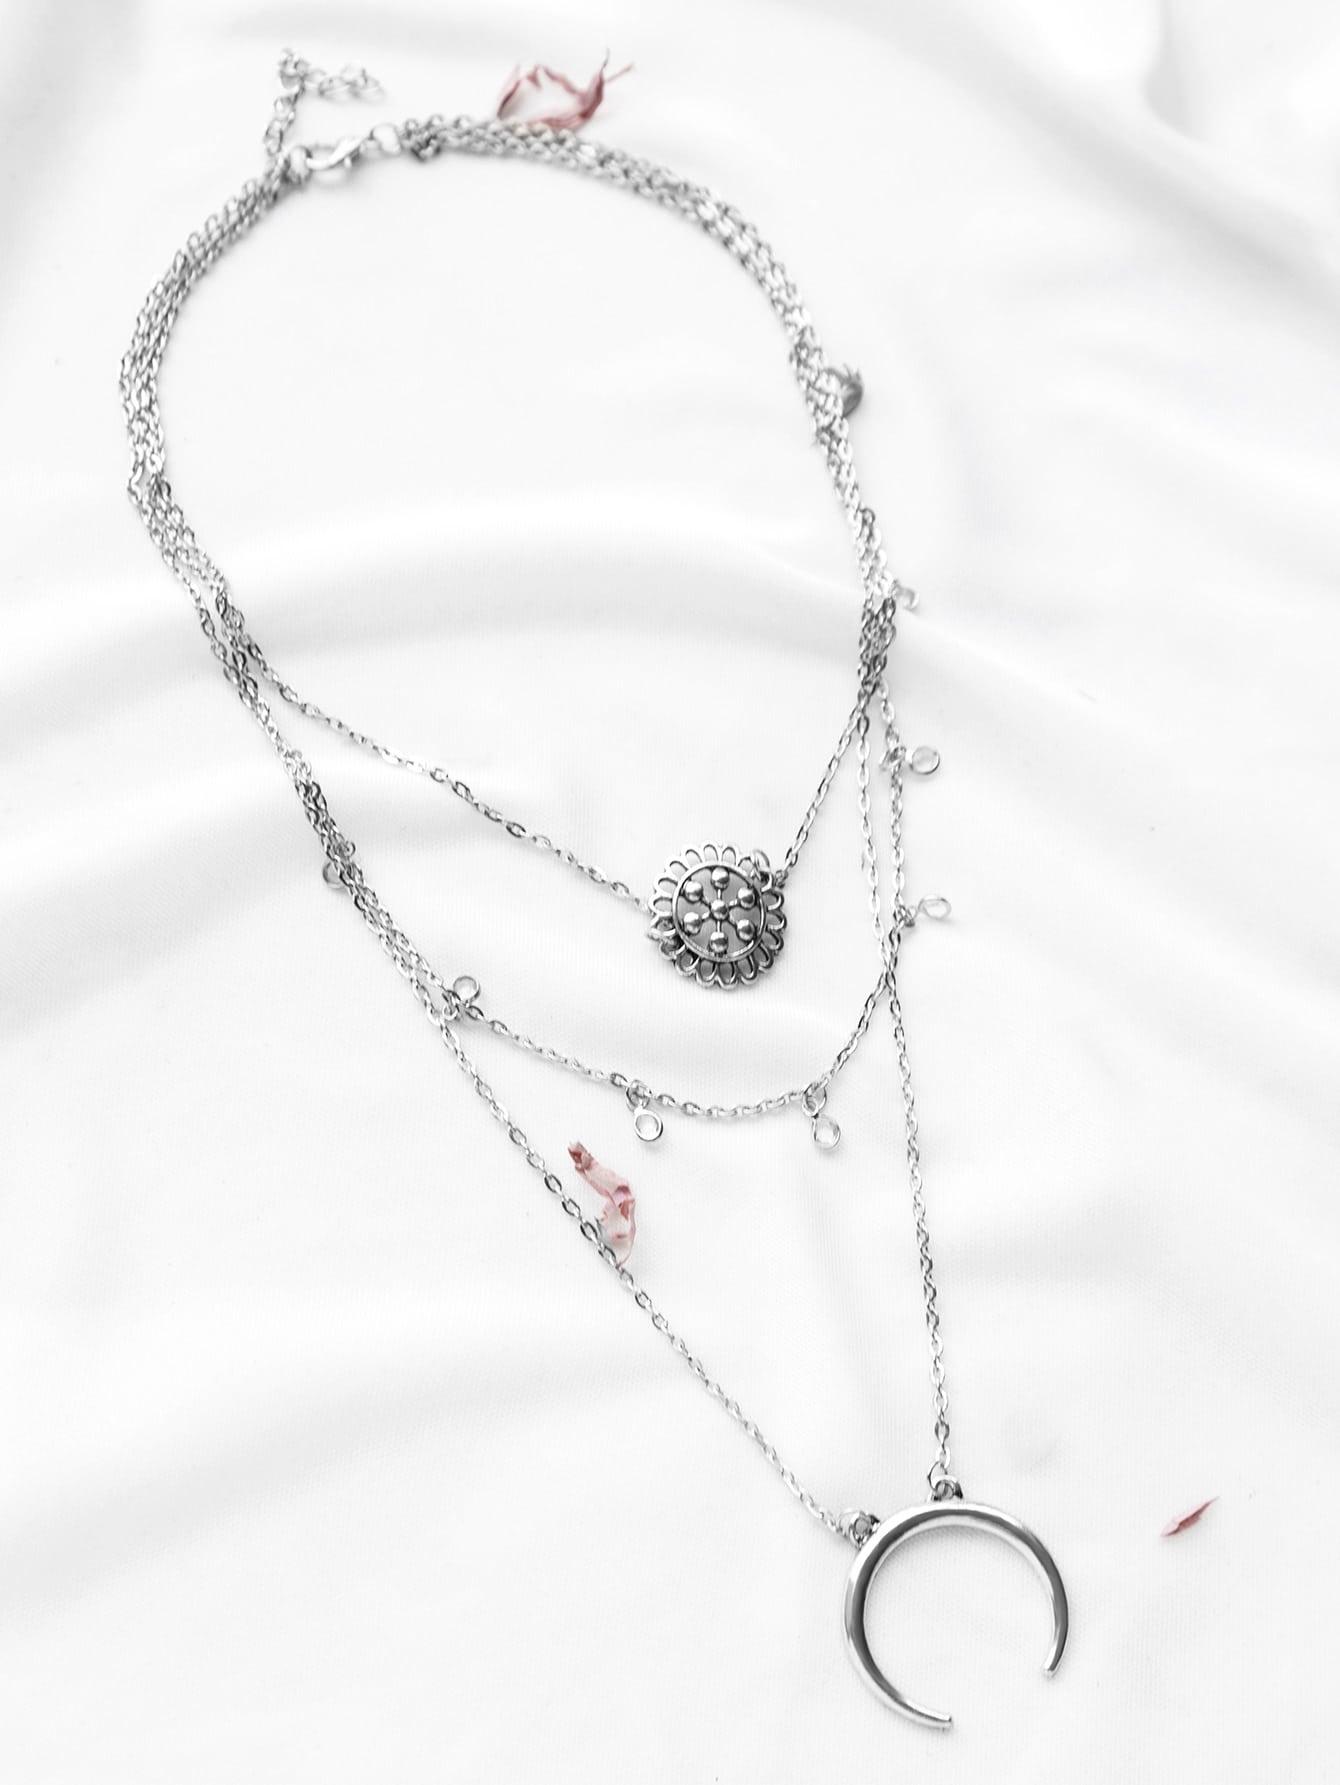 Silver Layered Pendant Boho Necklace